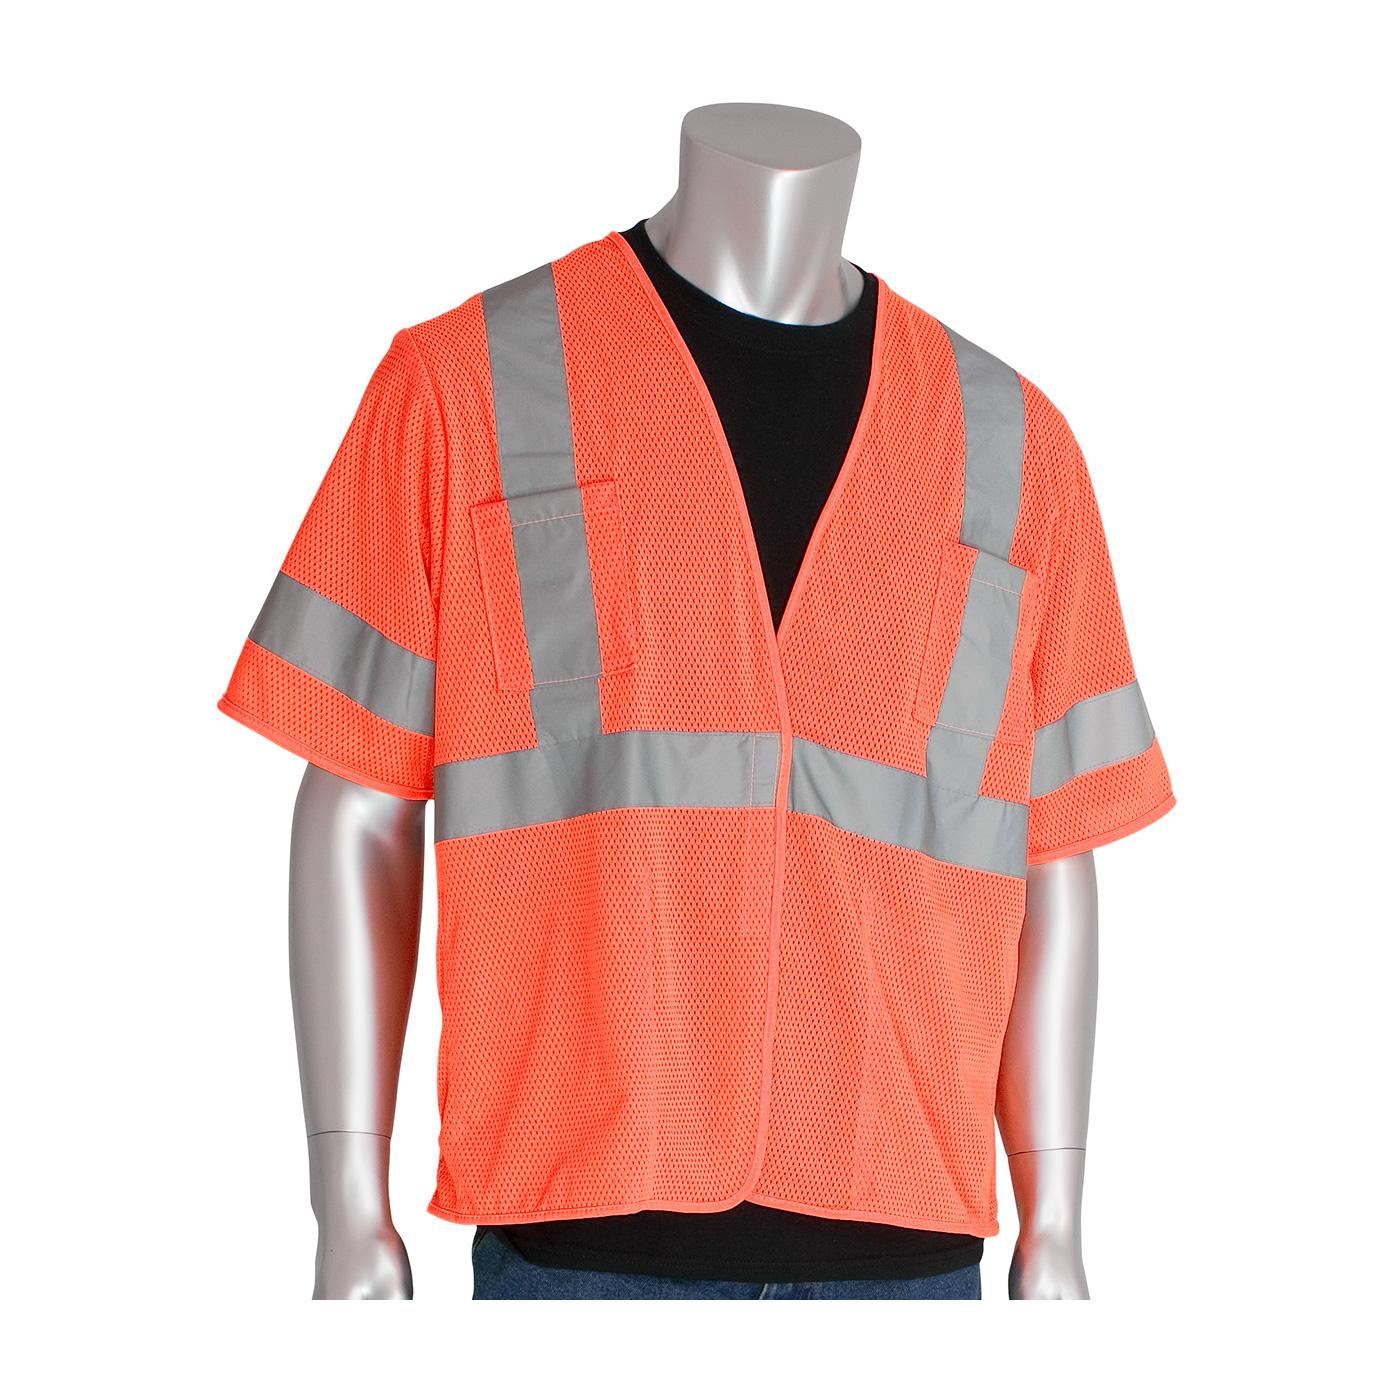 ANSI Type R Class 3 Value Four Pocket Mesh Vest, Hi-Vis Orange, 4XL